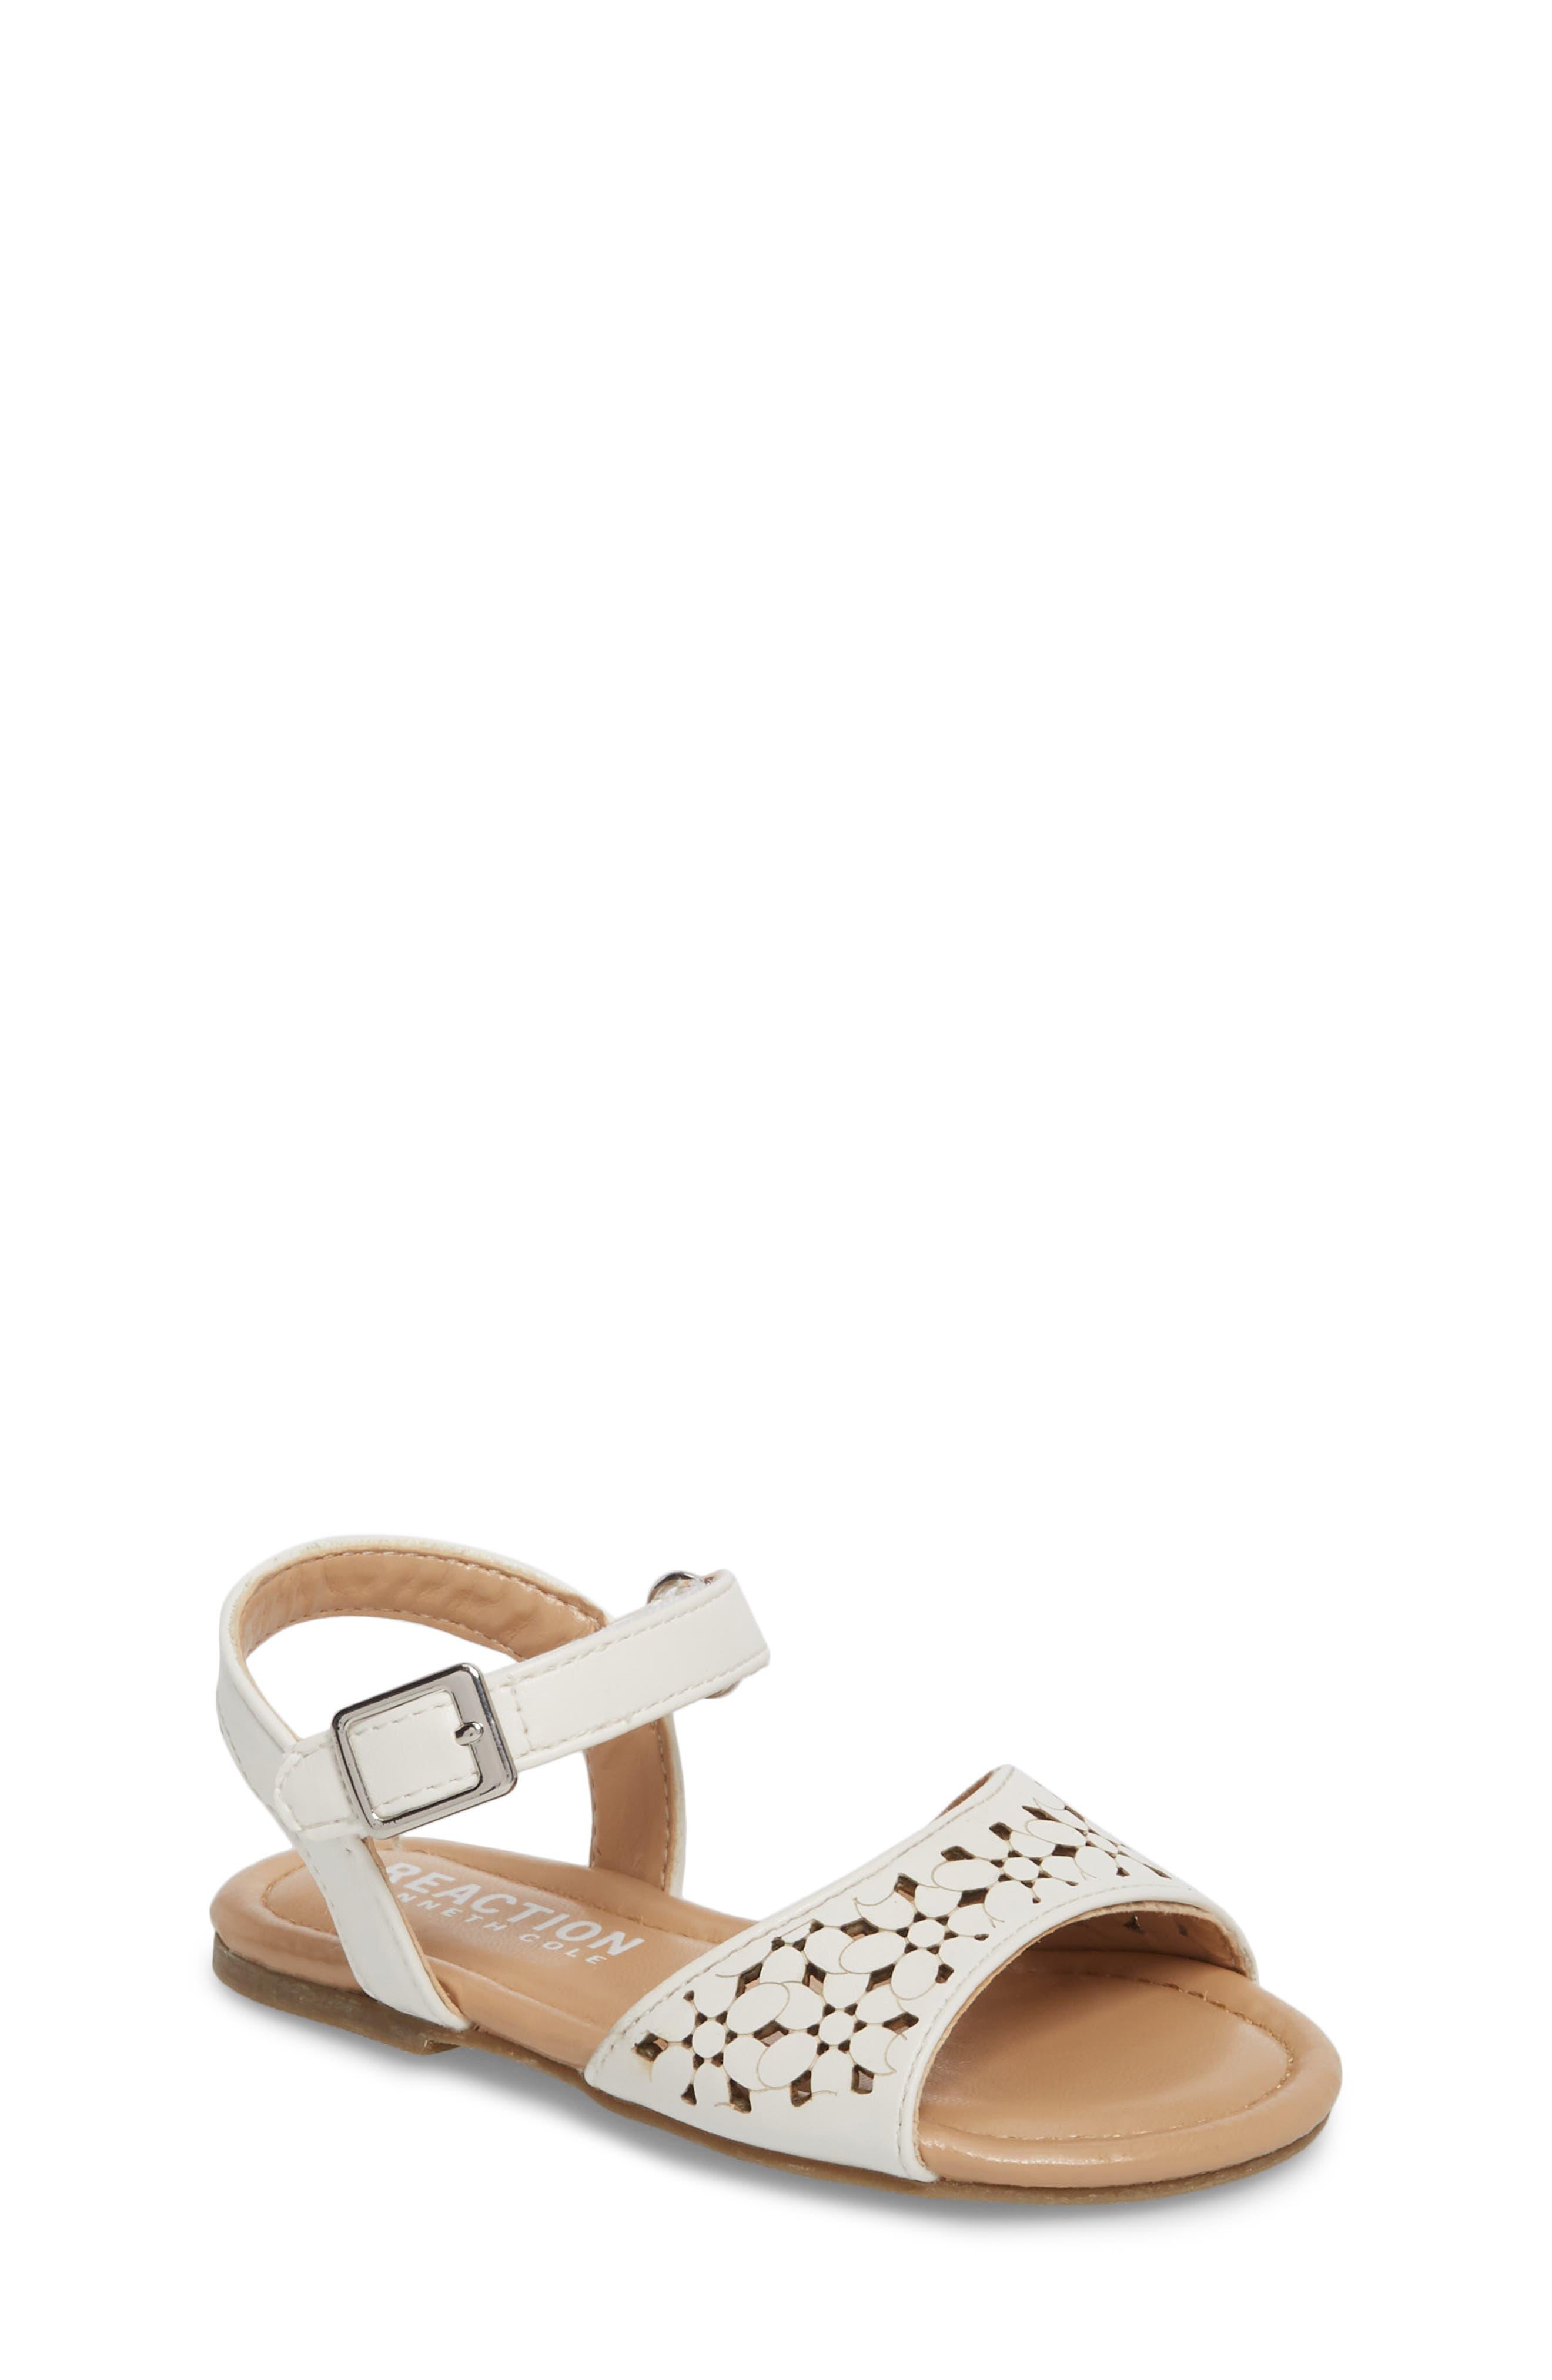 Kiera Perforated Sandal,                         Main,                         color, 100